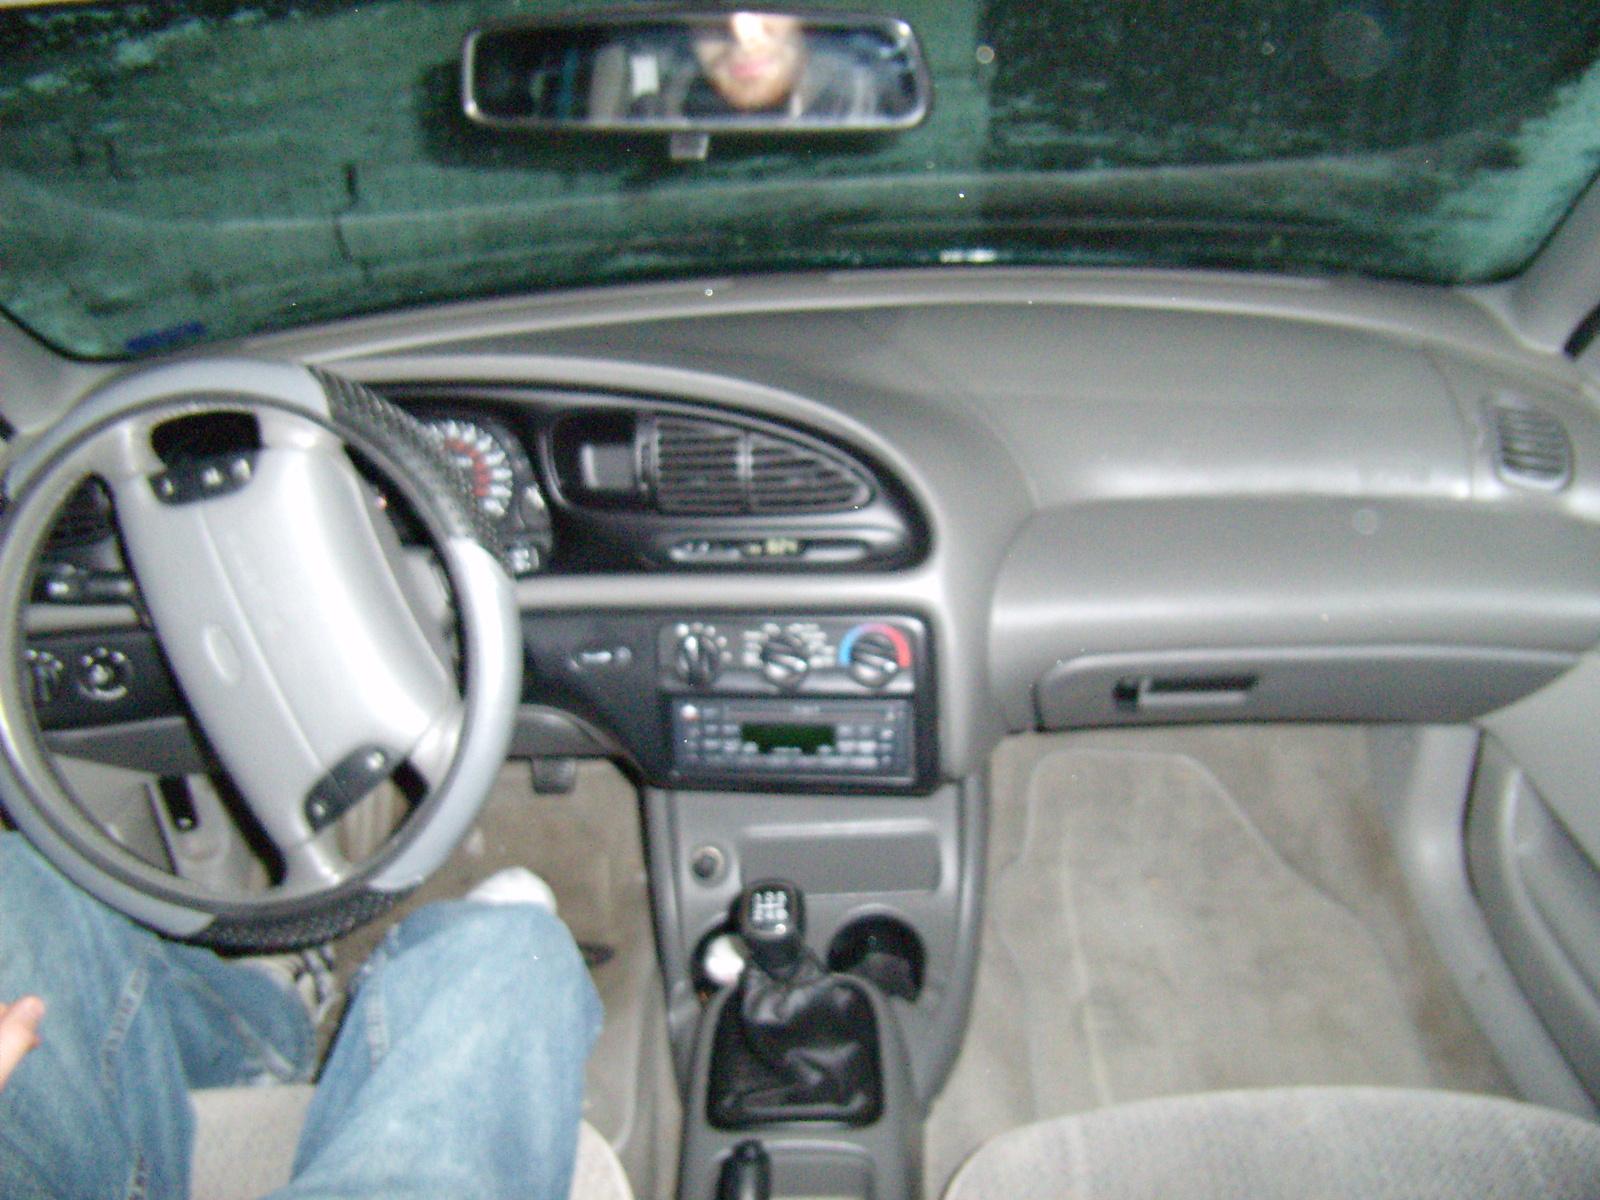 1998 Ford Contour Parts 98 Wiring Stereo Install Dash Kit Escort Car Radio Installation Electronics 1600x1200